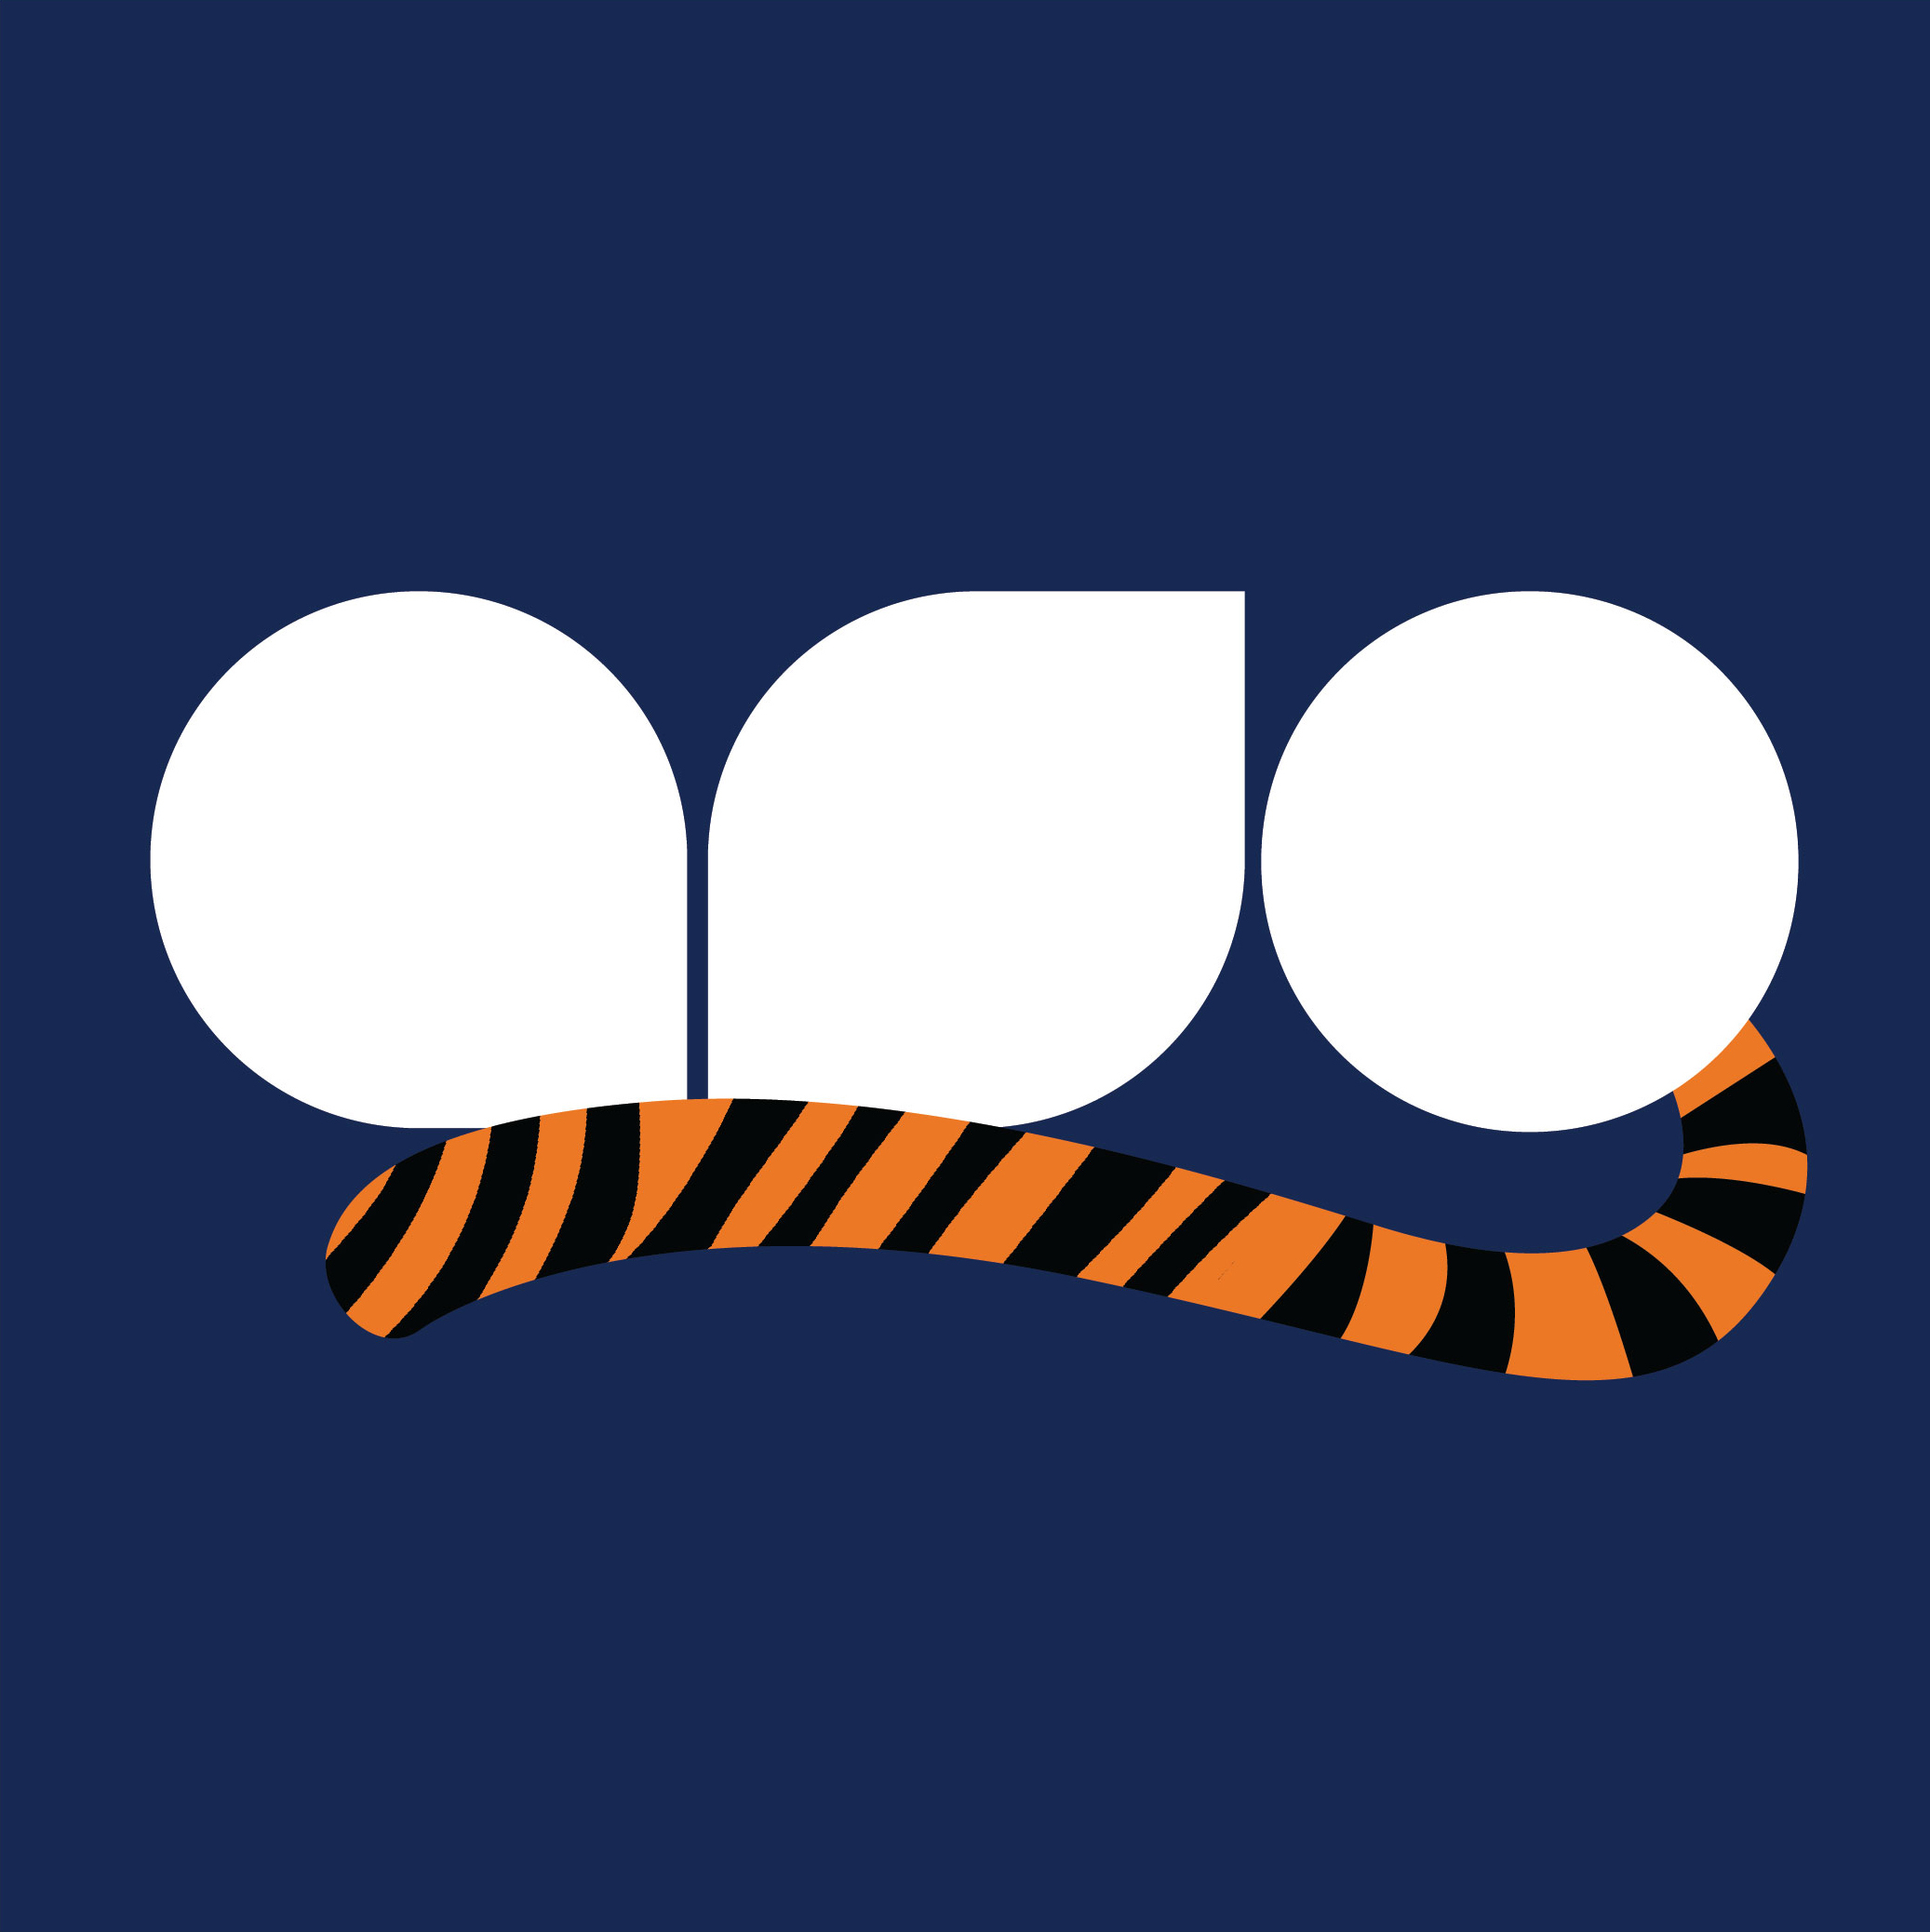 Auburn_WarEagle_Logo-1.jpg#asset:2458